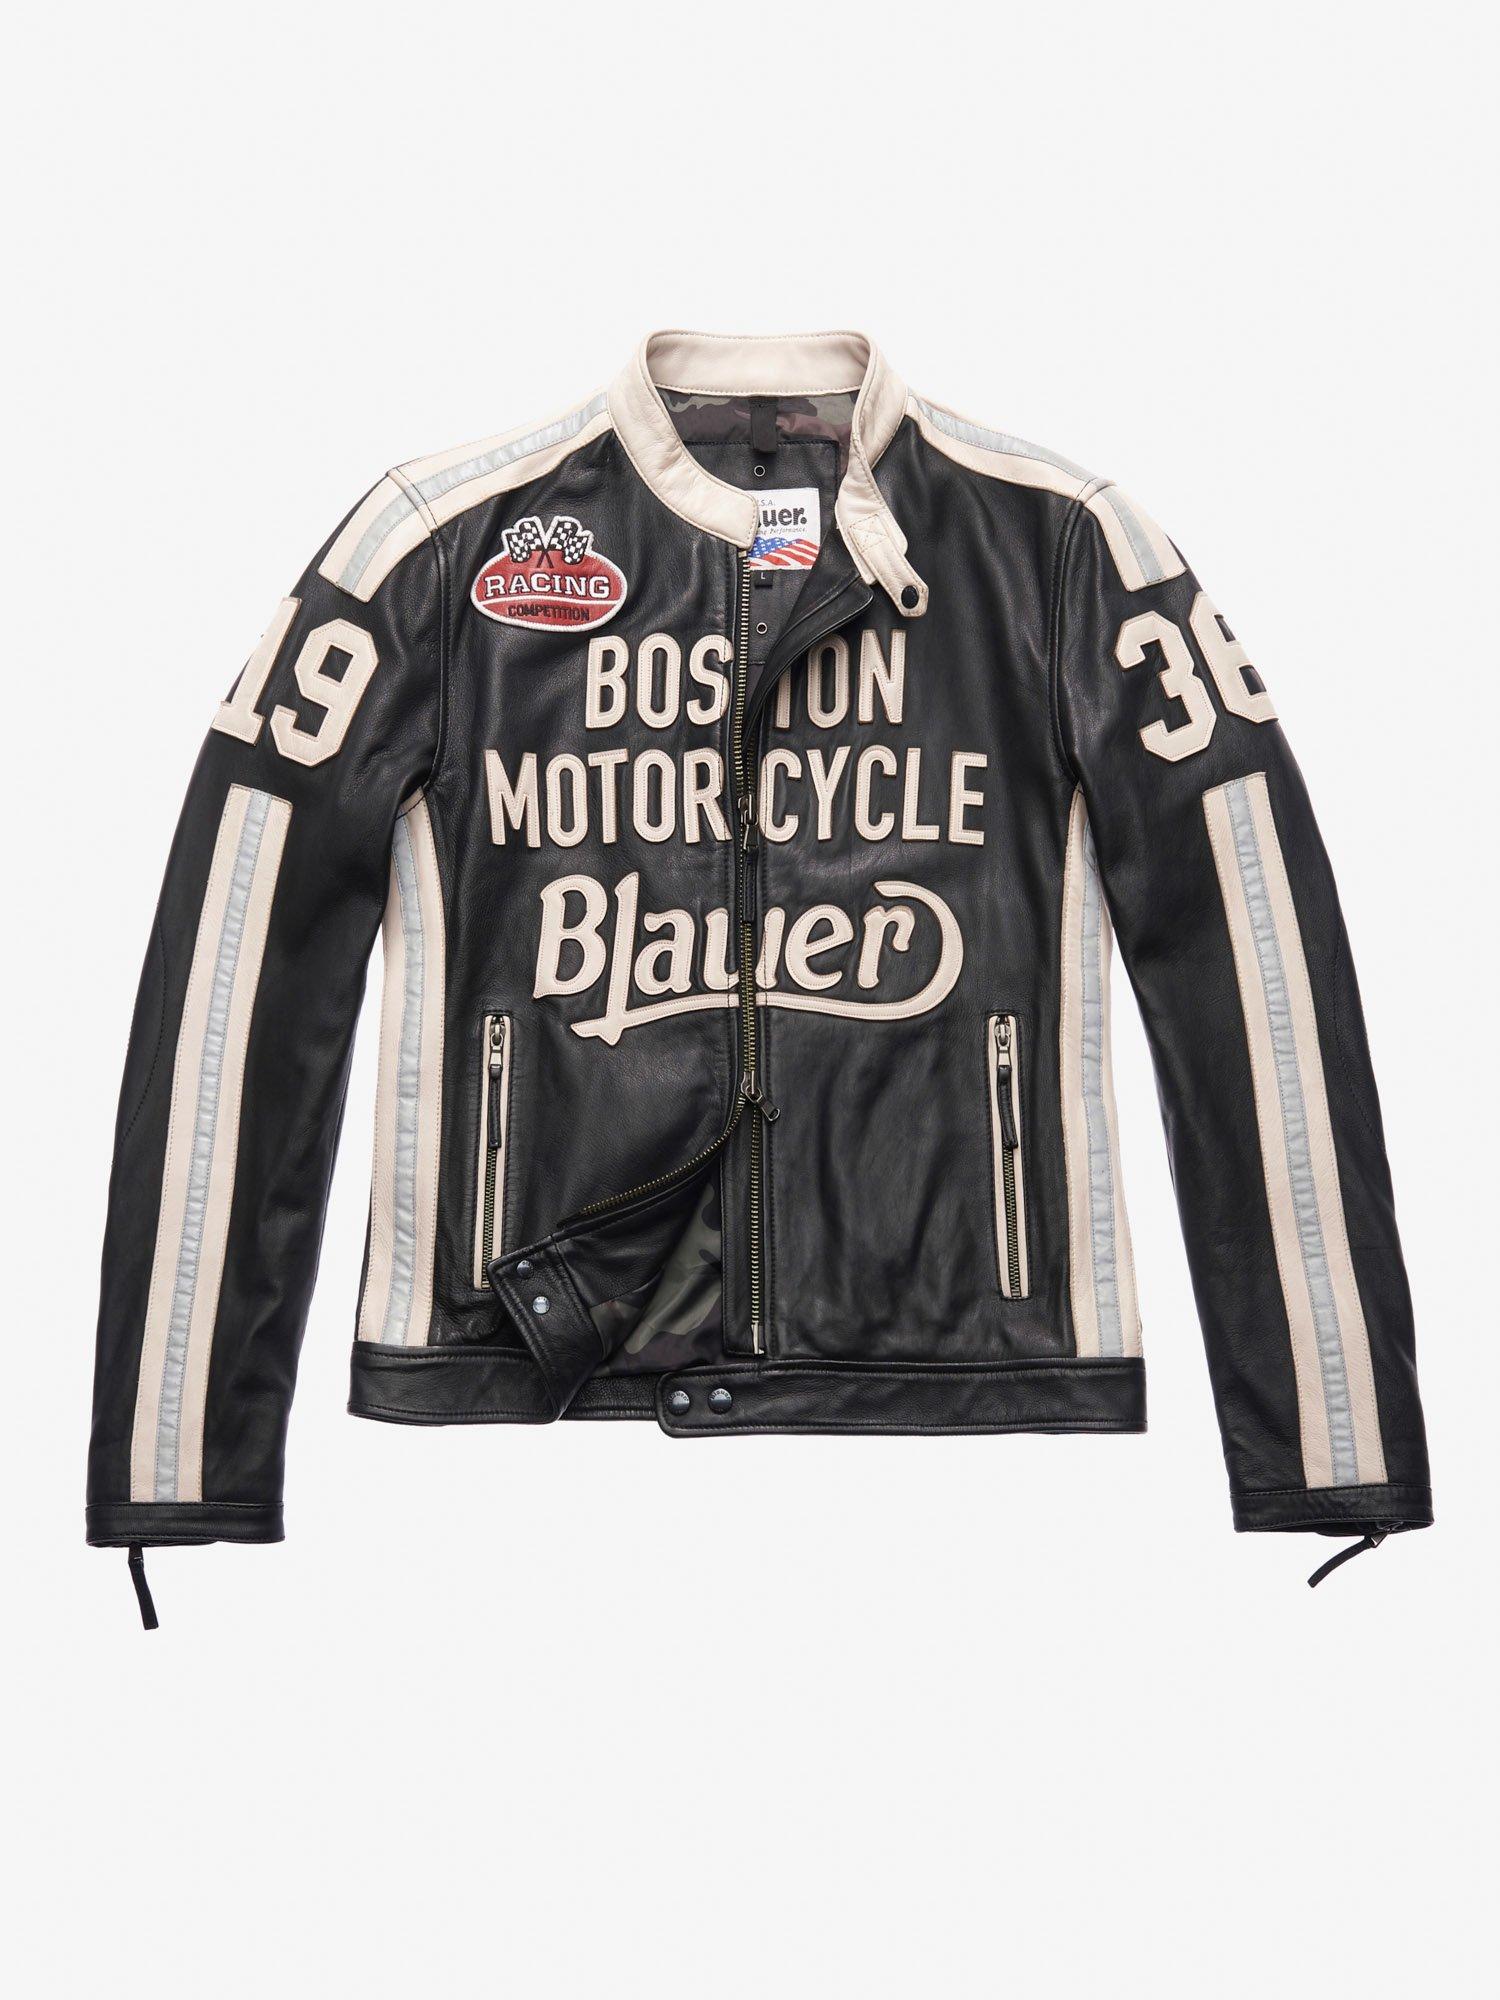 Blauer - THOMAS LEATHER MOTORCYCLE JACKET - Black - Blauer